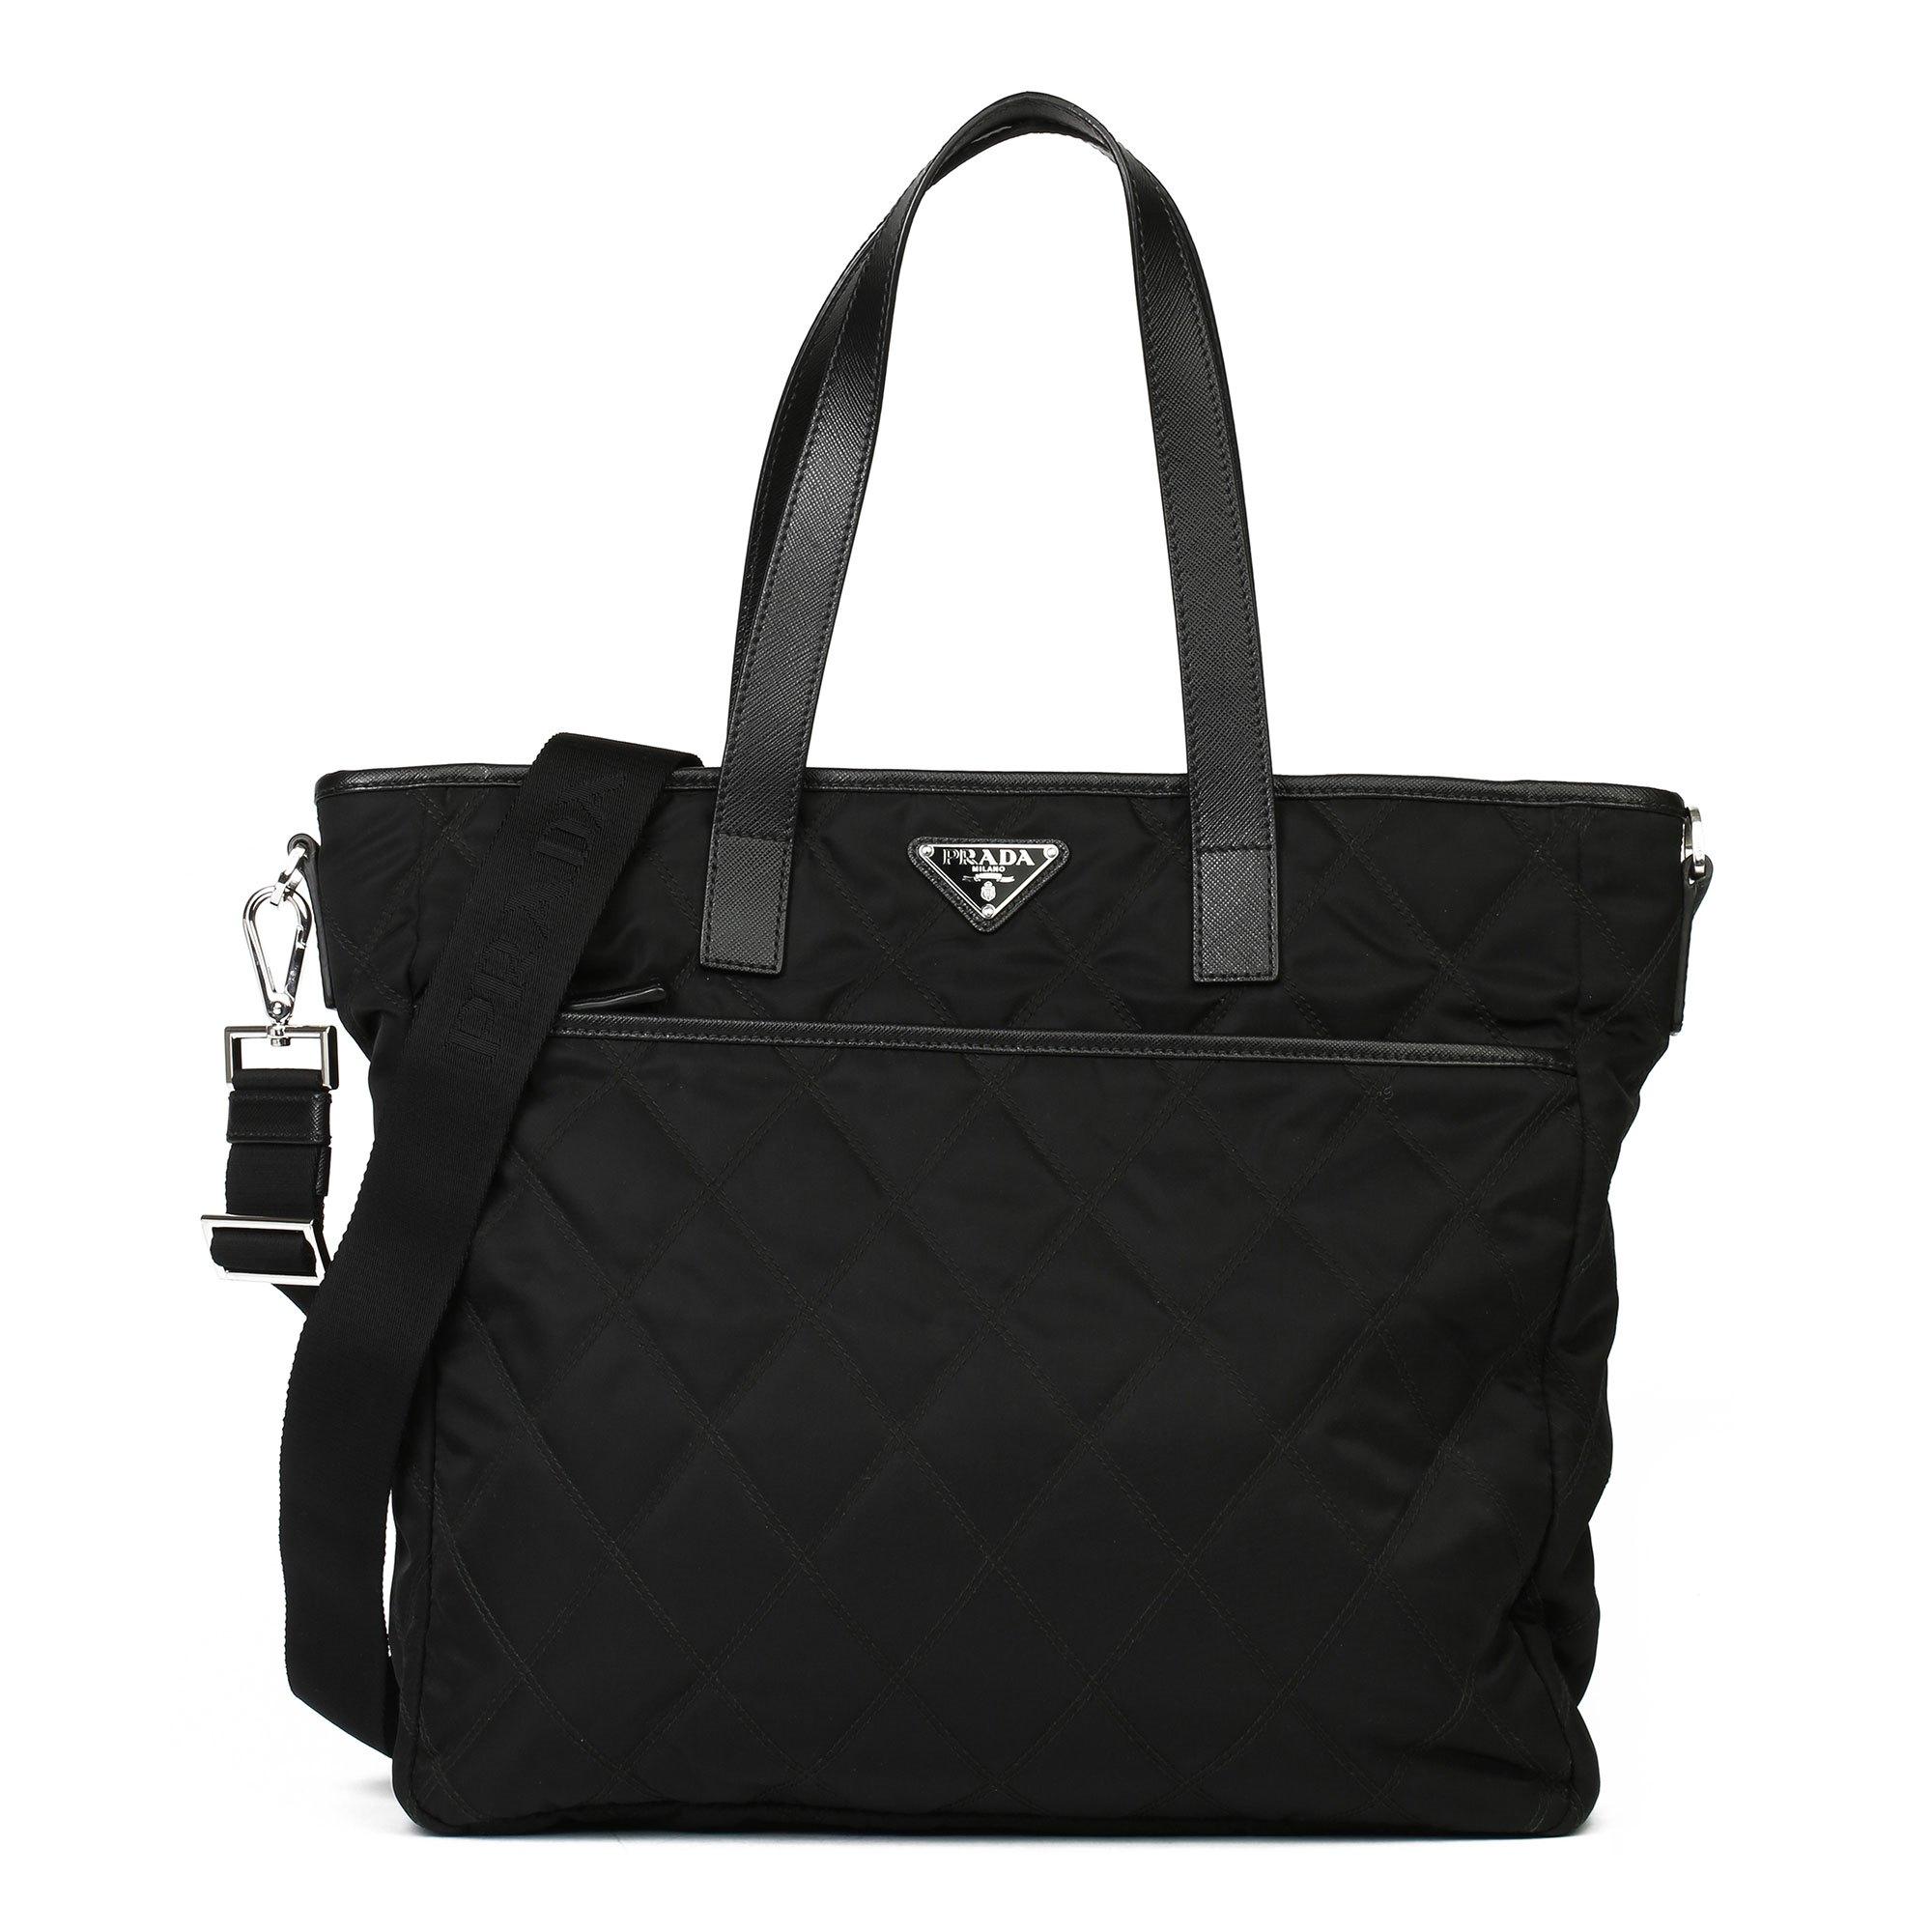 Prada Black Quilted Nylon & Saffiano Leather Shoulder Tote